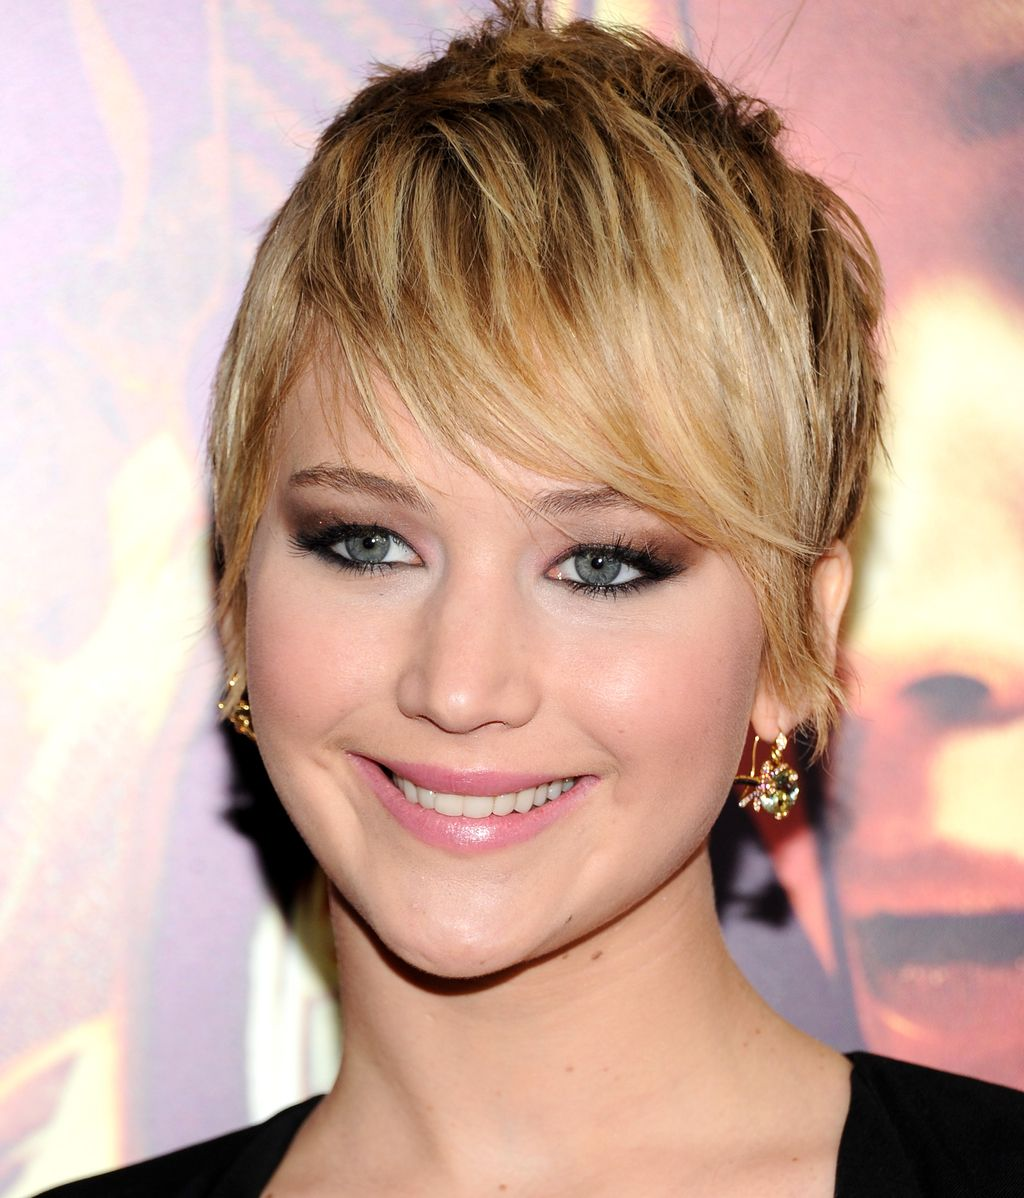 Jennifer Lawrence y la historia de... ¡Sus juguetes sexuales!